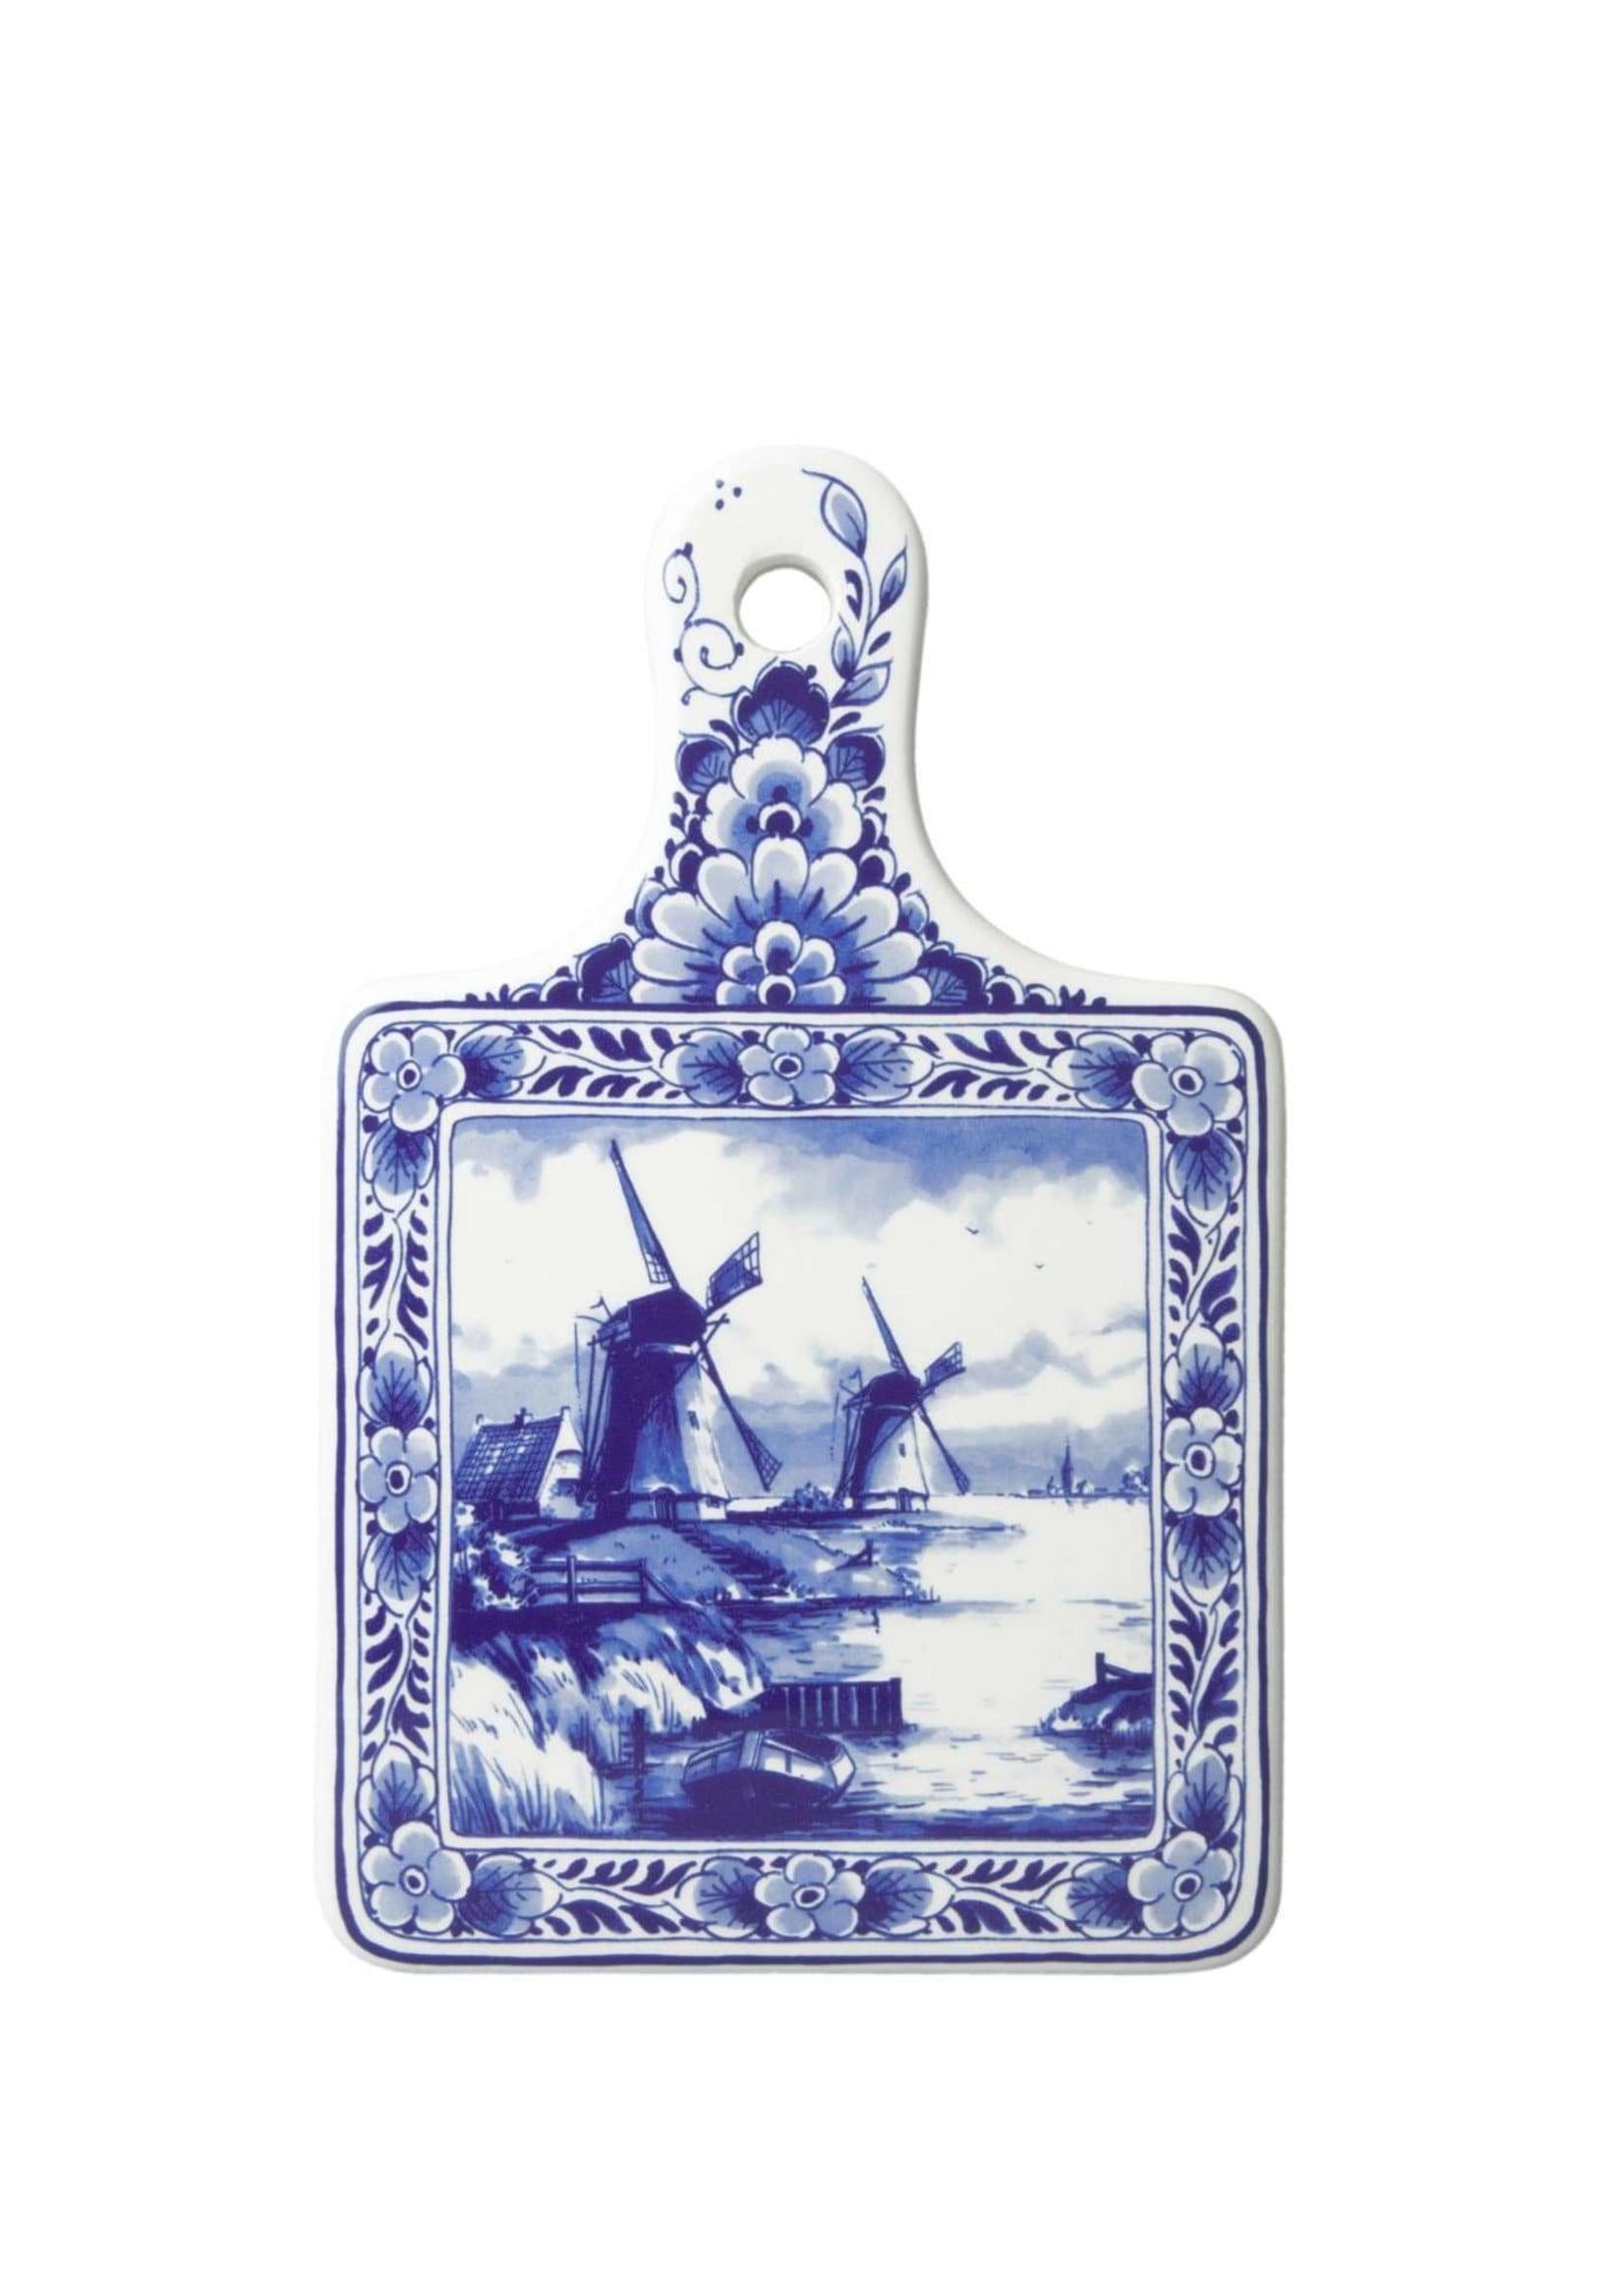 Delfts Blauwe Kaasplank met Windmolens, Klein